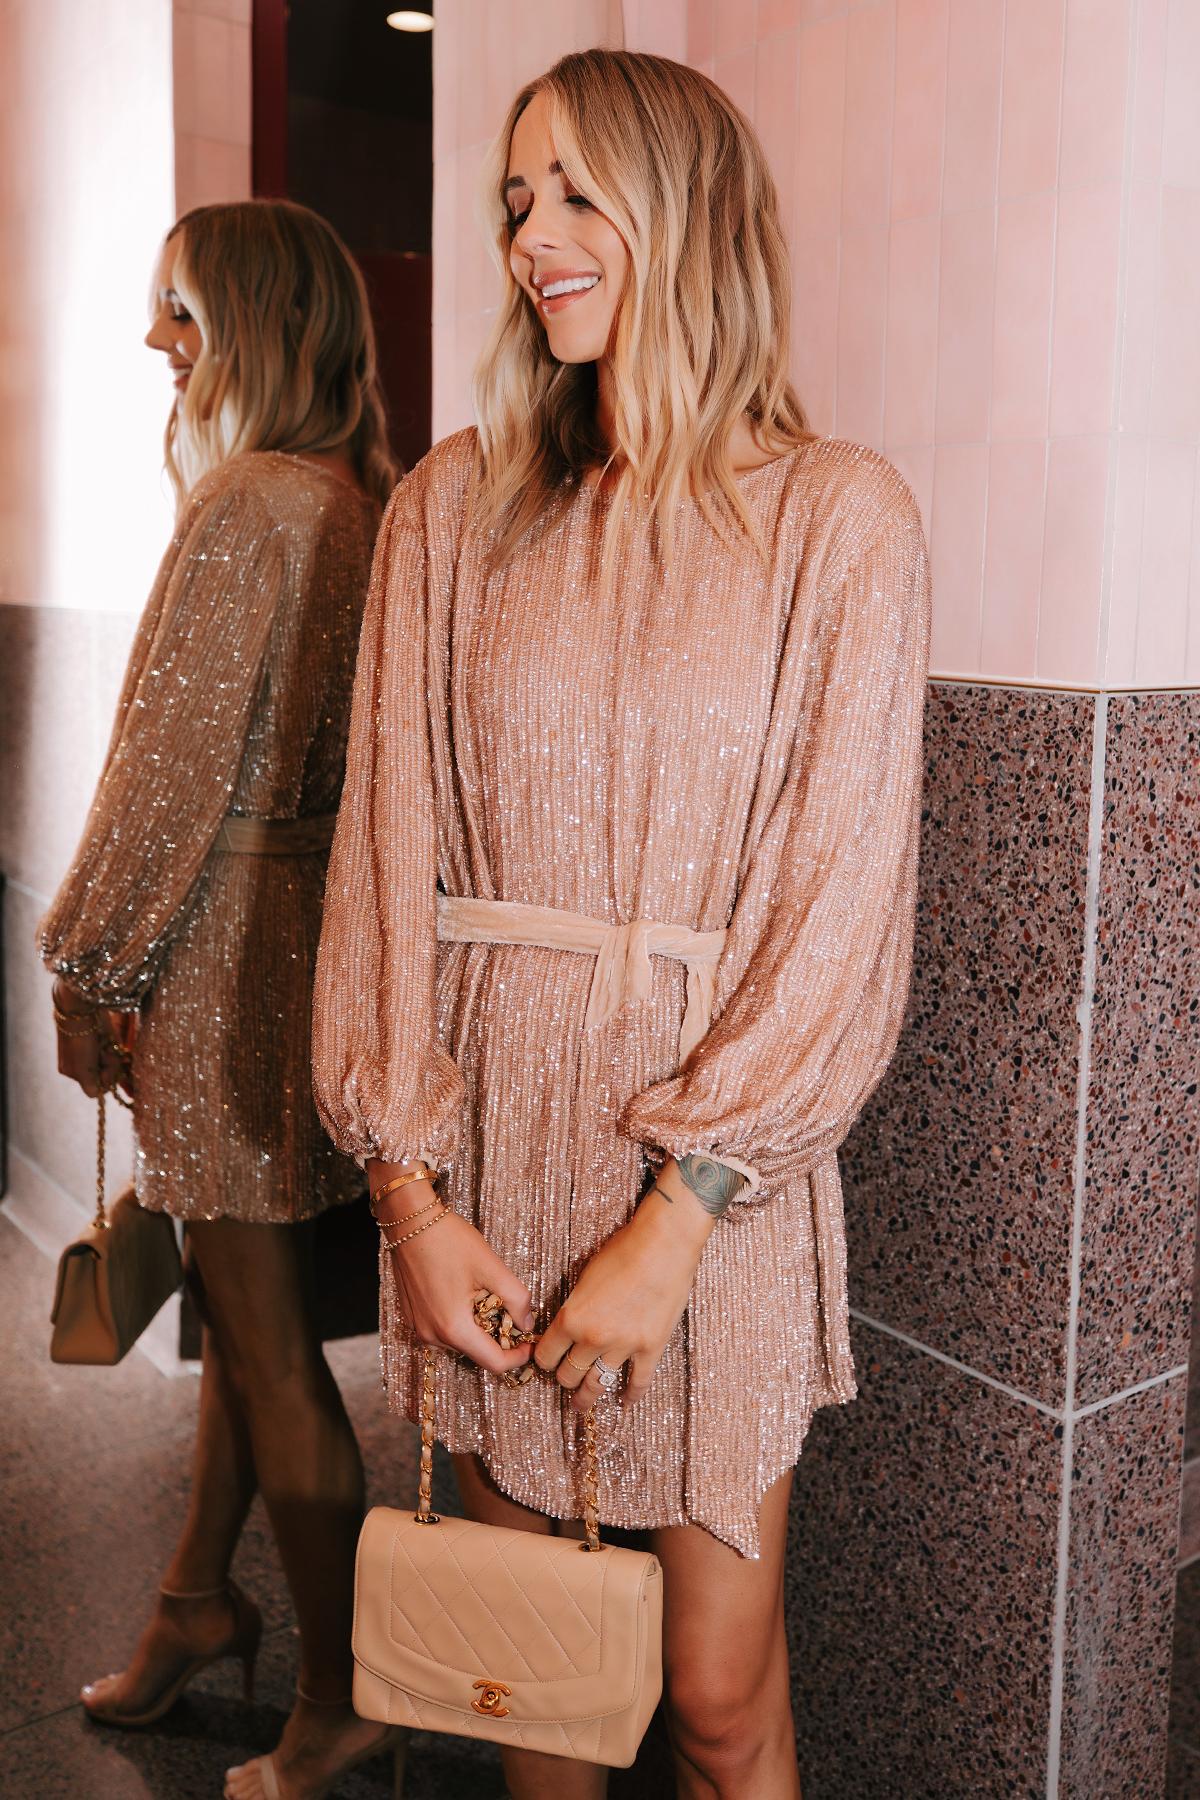 Fashion Jackson Wearing Retrofete Blush sequin holiday party dress Chanel Beige Handbag 5